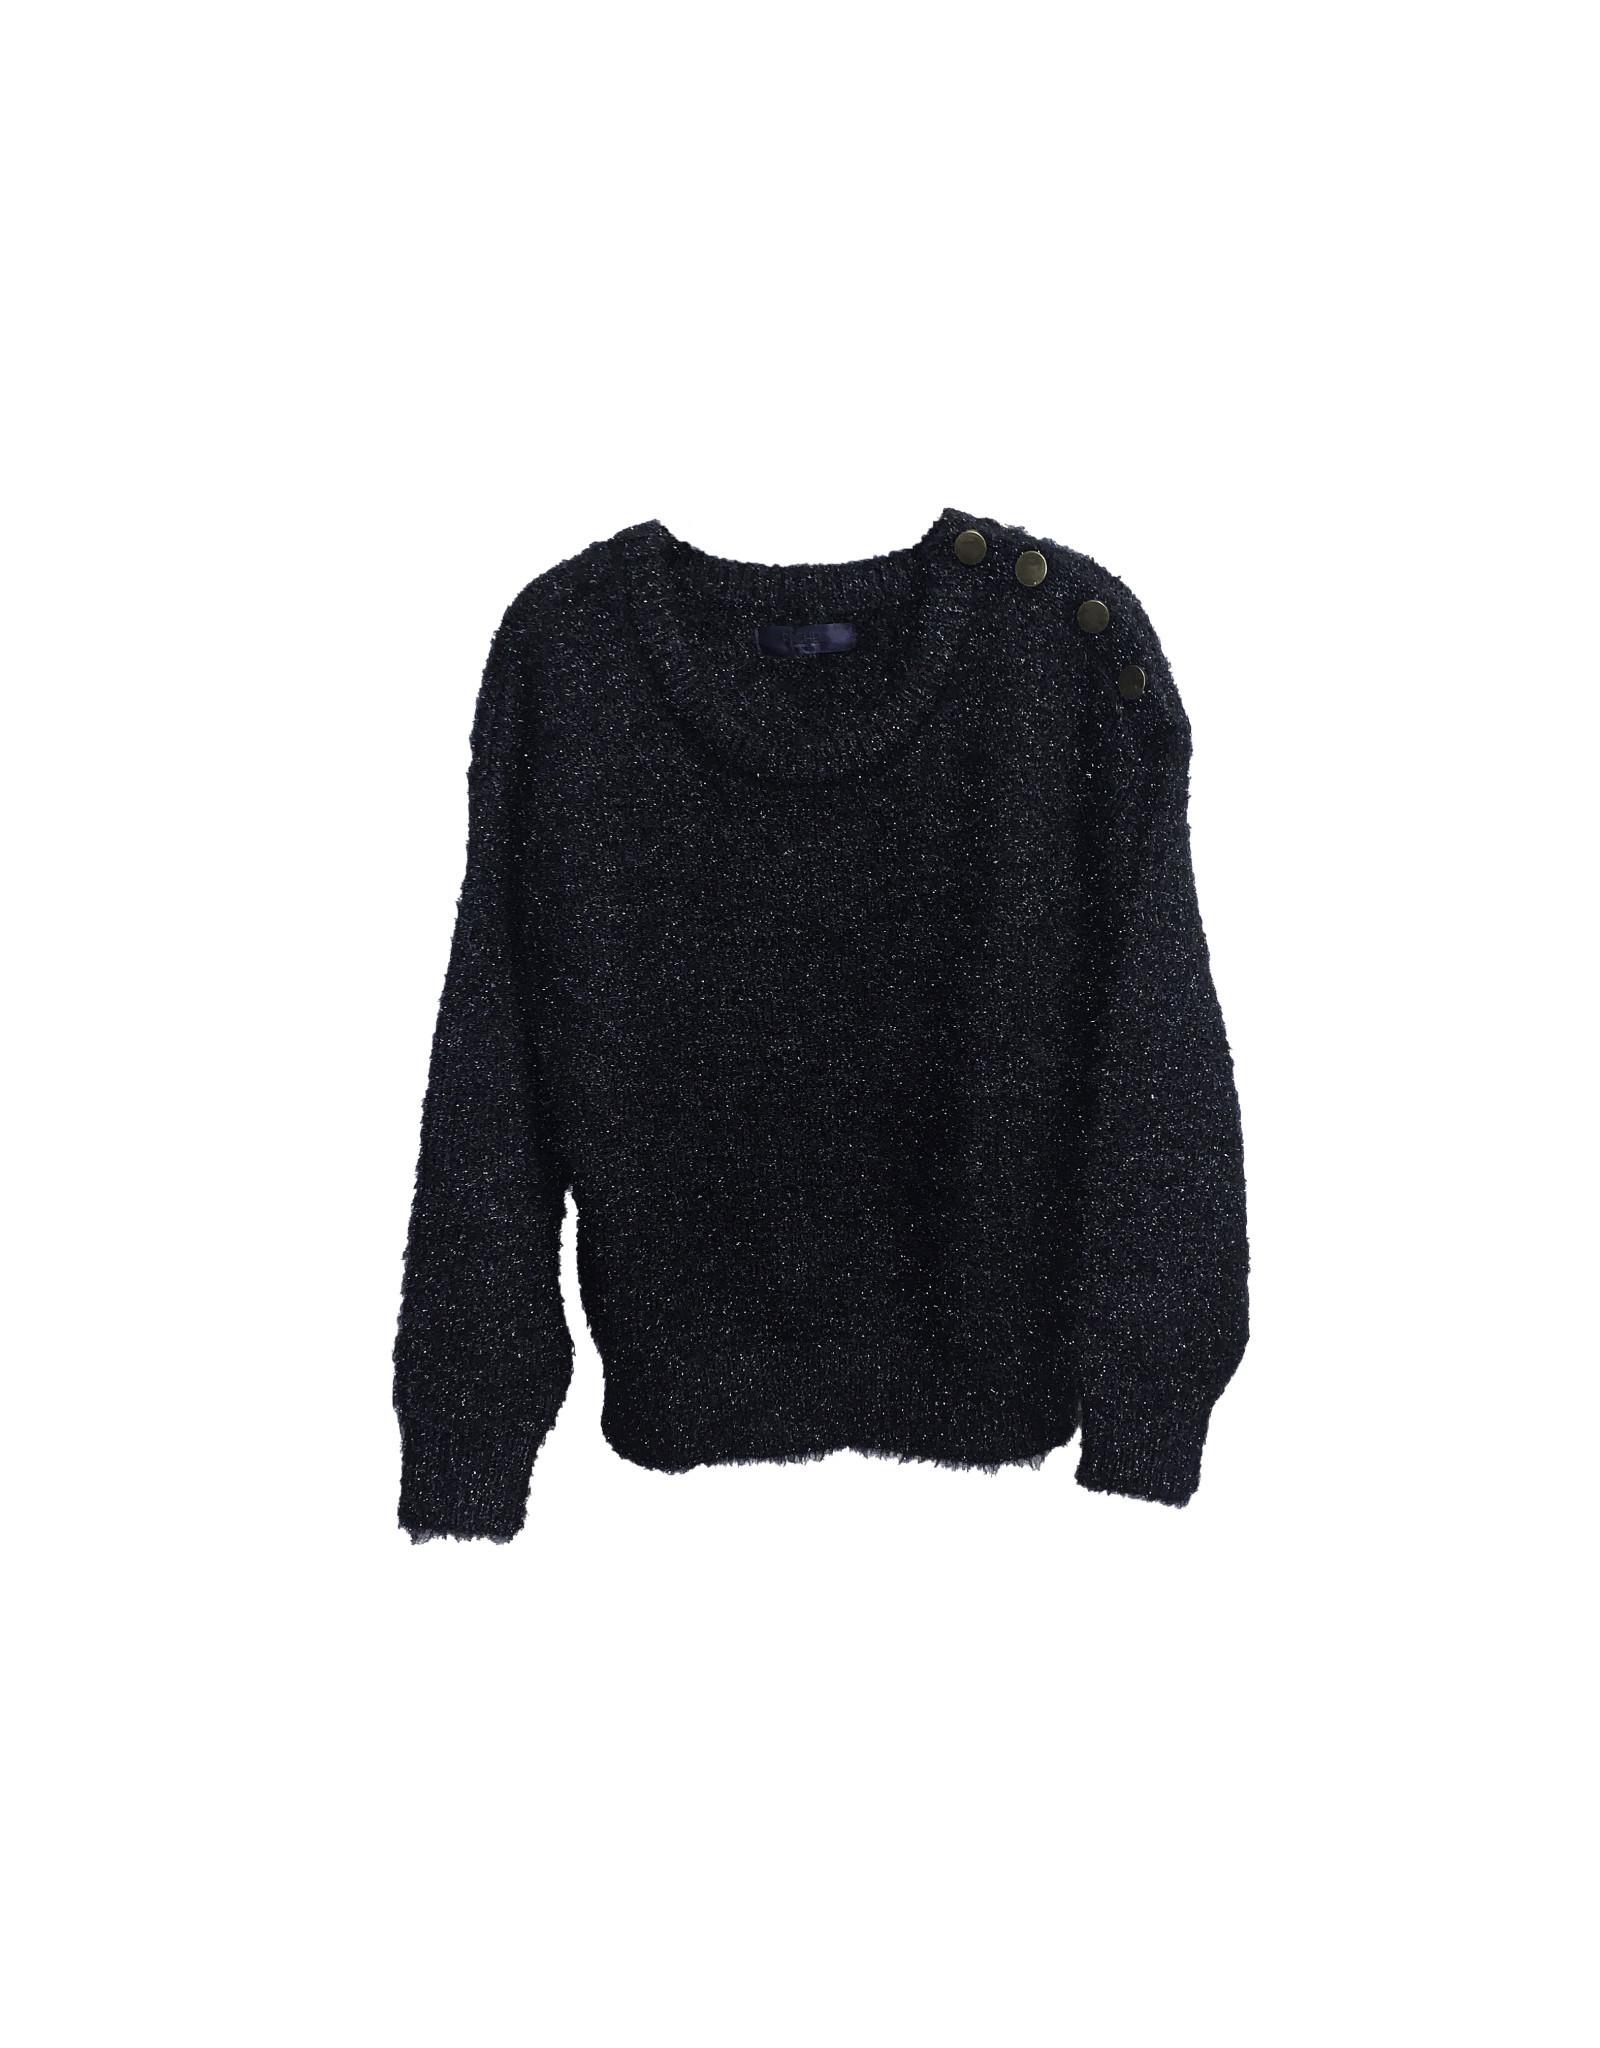 RACHEL ROY RACHEL ROY  Amara Fuzzy Sweater  Size4